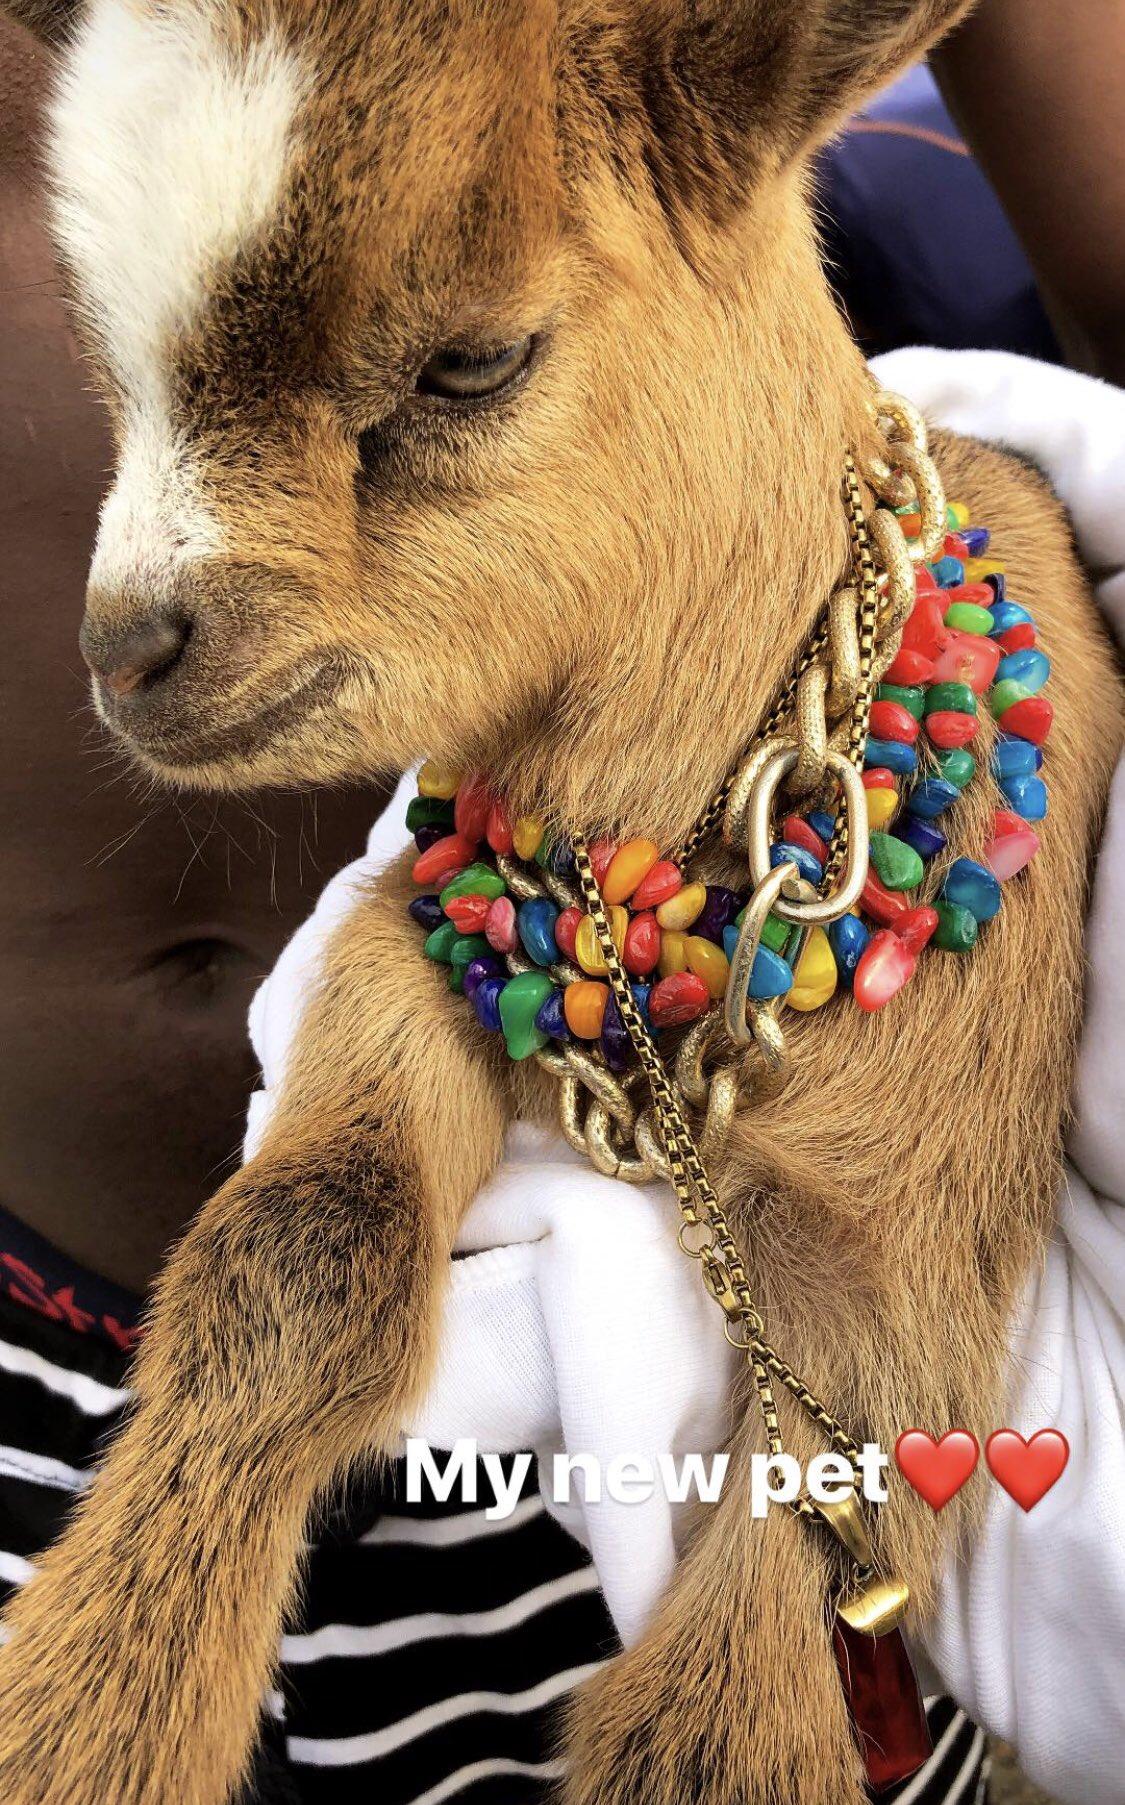 Wizkid Unveils Goat As His New Pet (2)